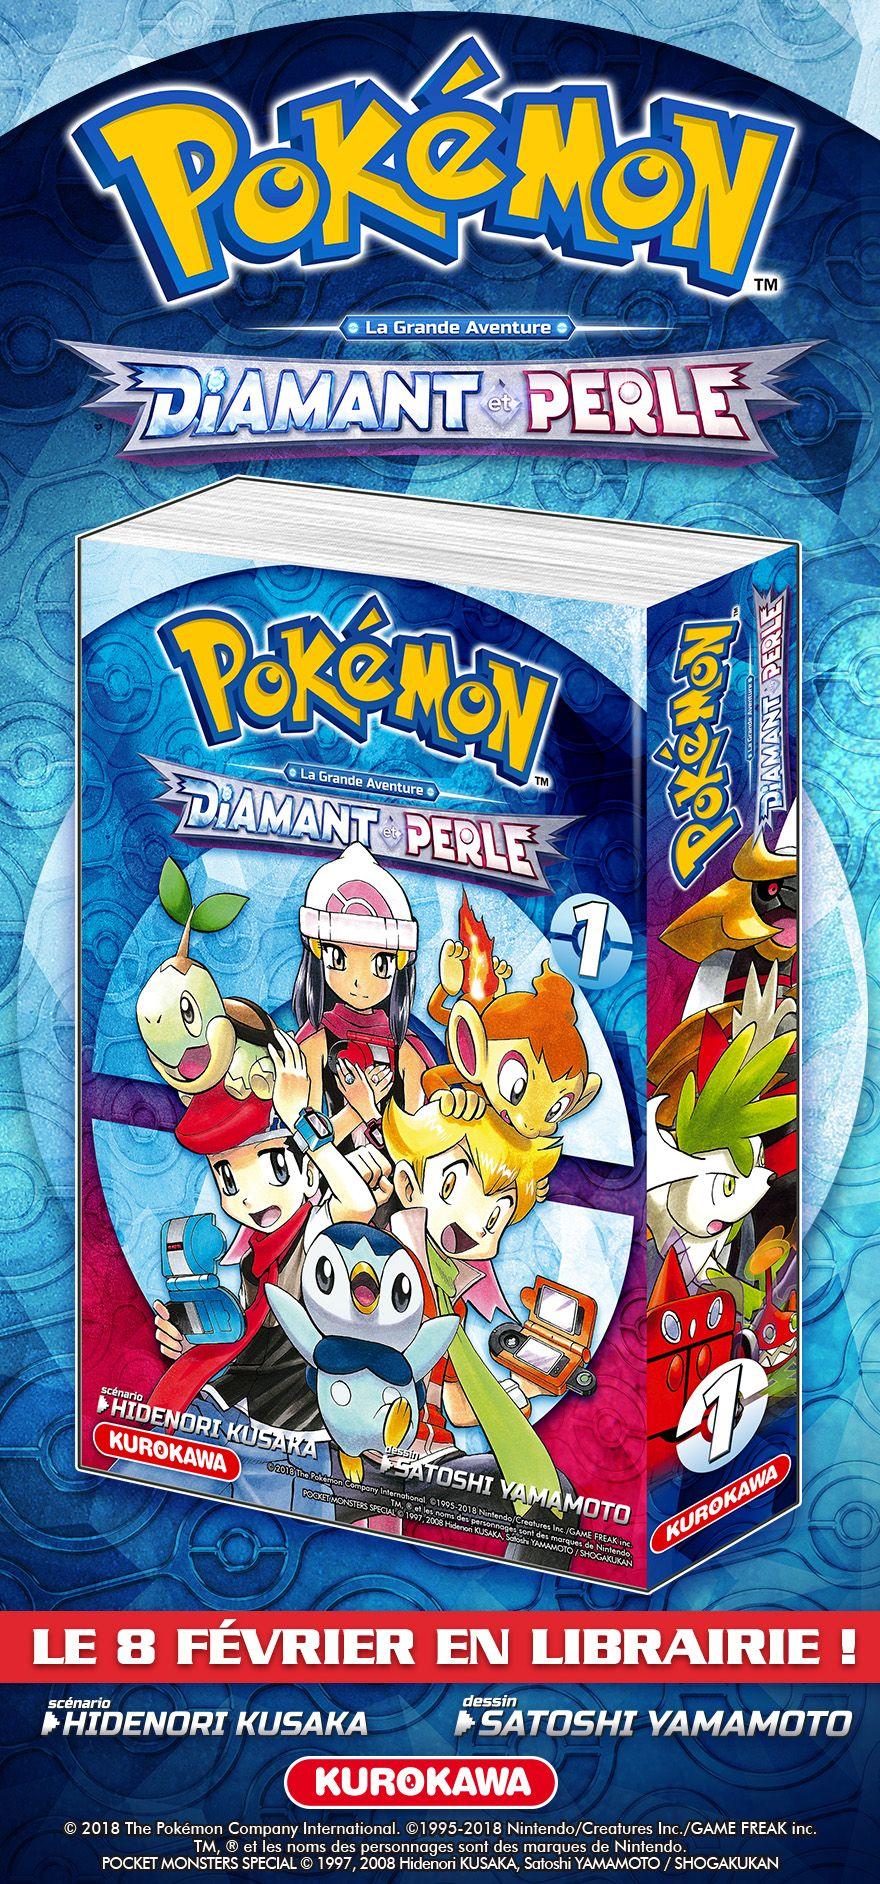 Nouveaux mangas pok mon la grande aventure chez kurokawa - Pokemon rare diamant ...